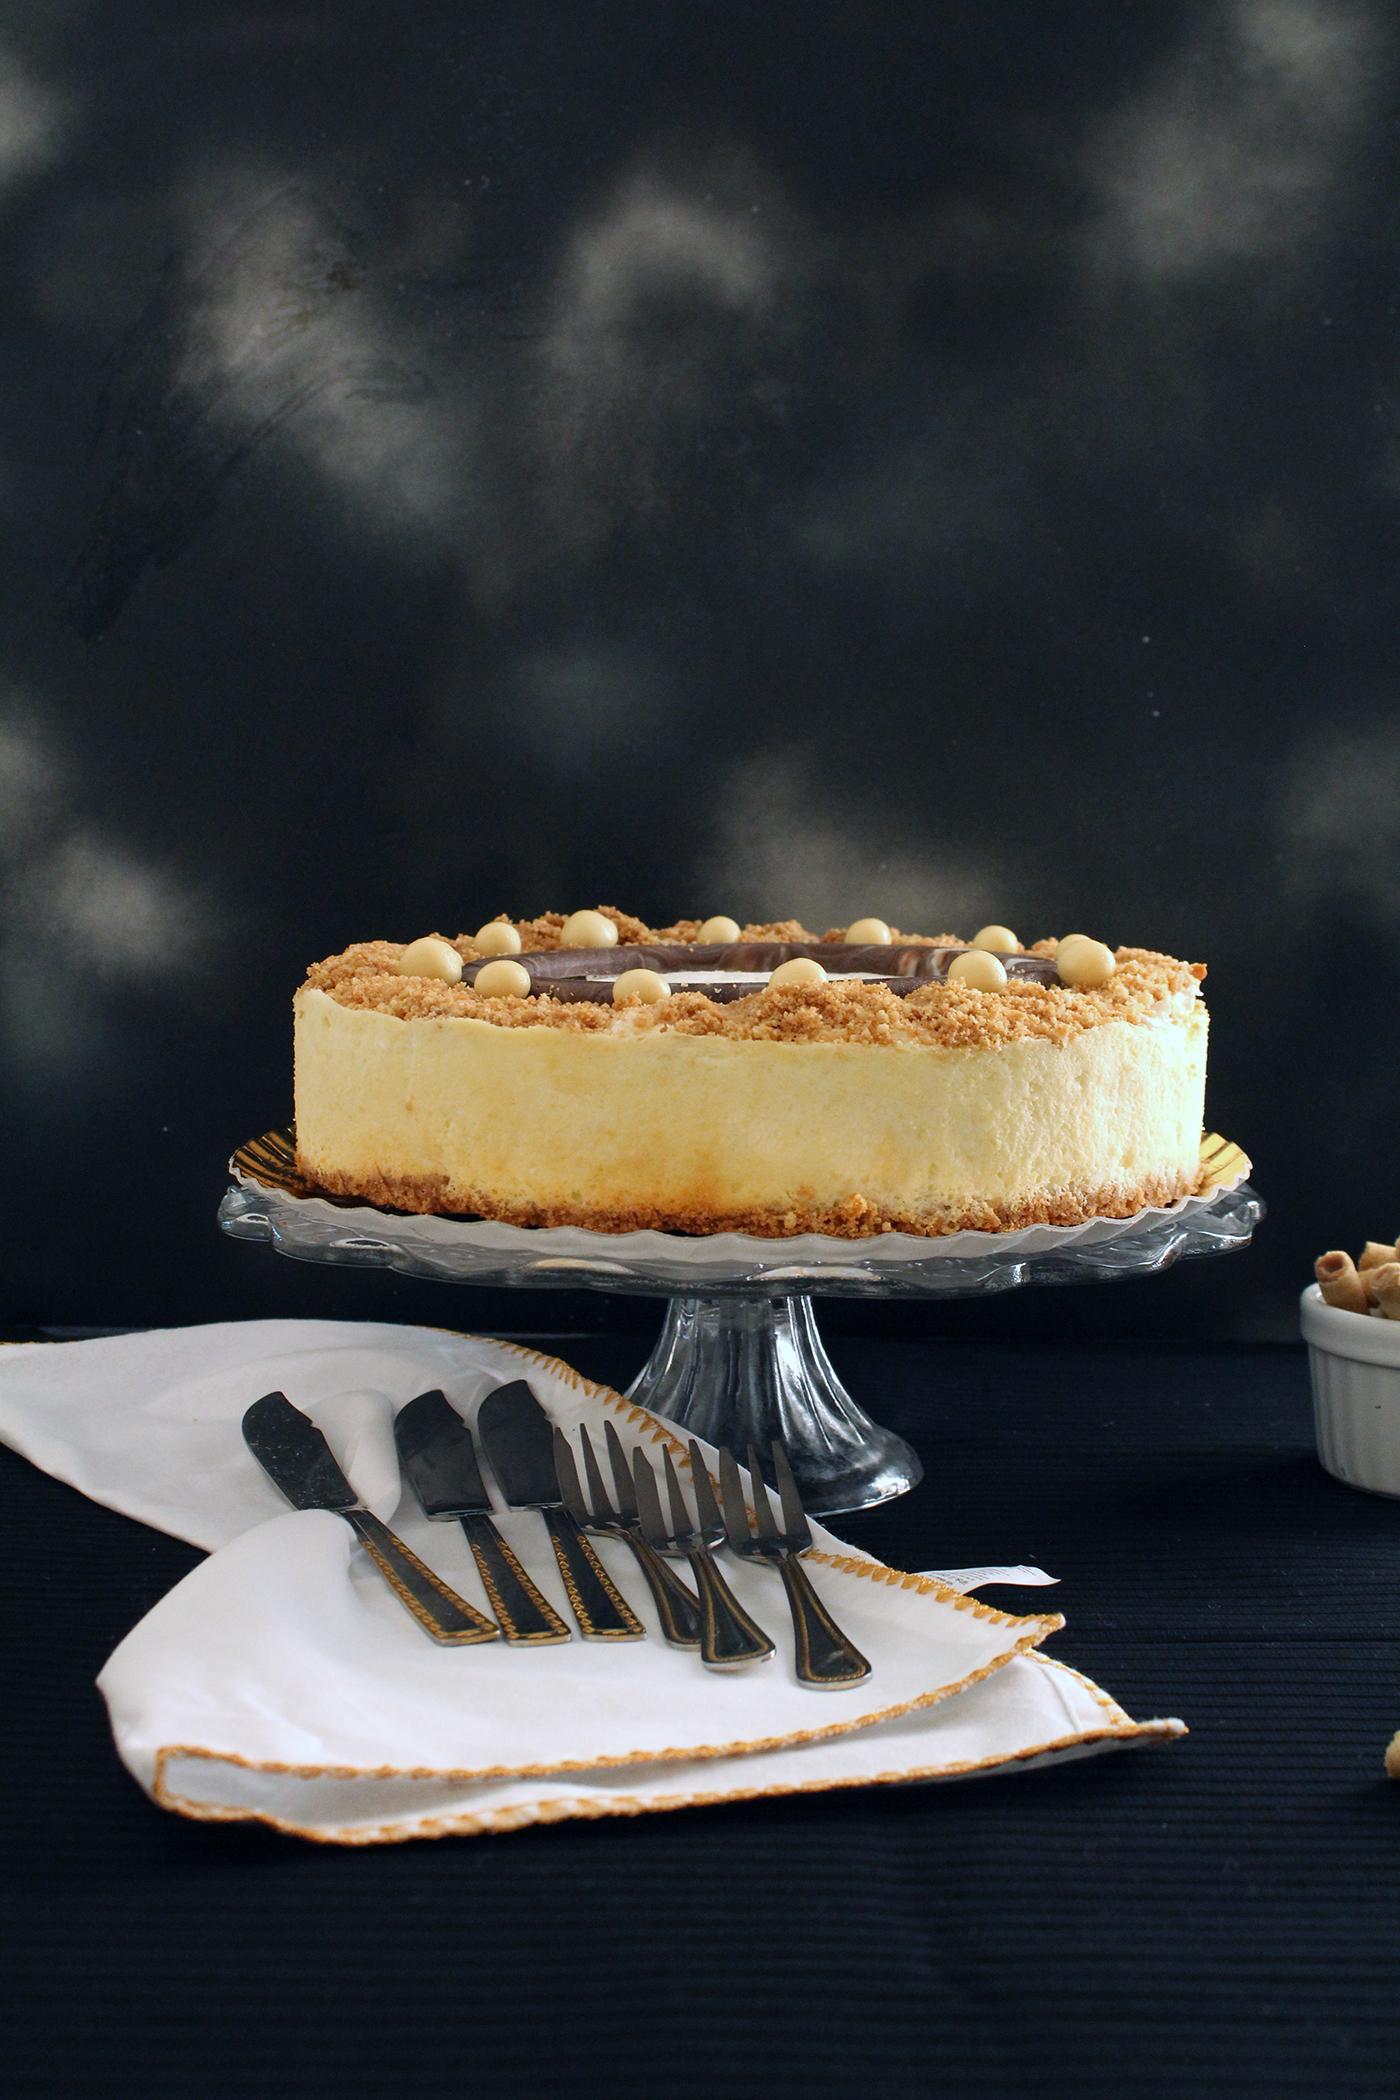 IMG 8260 - עוגת גבינה גבוהה וטעימה